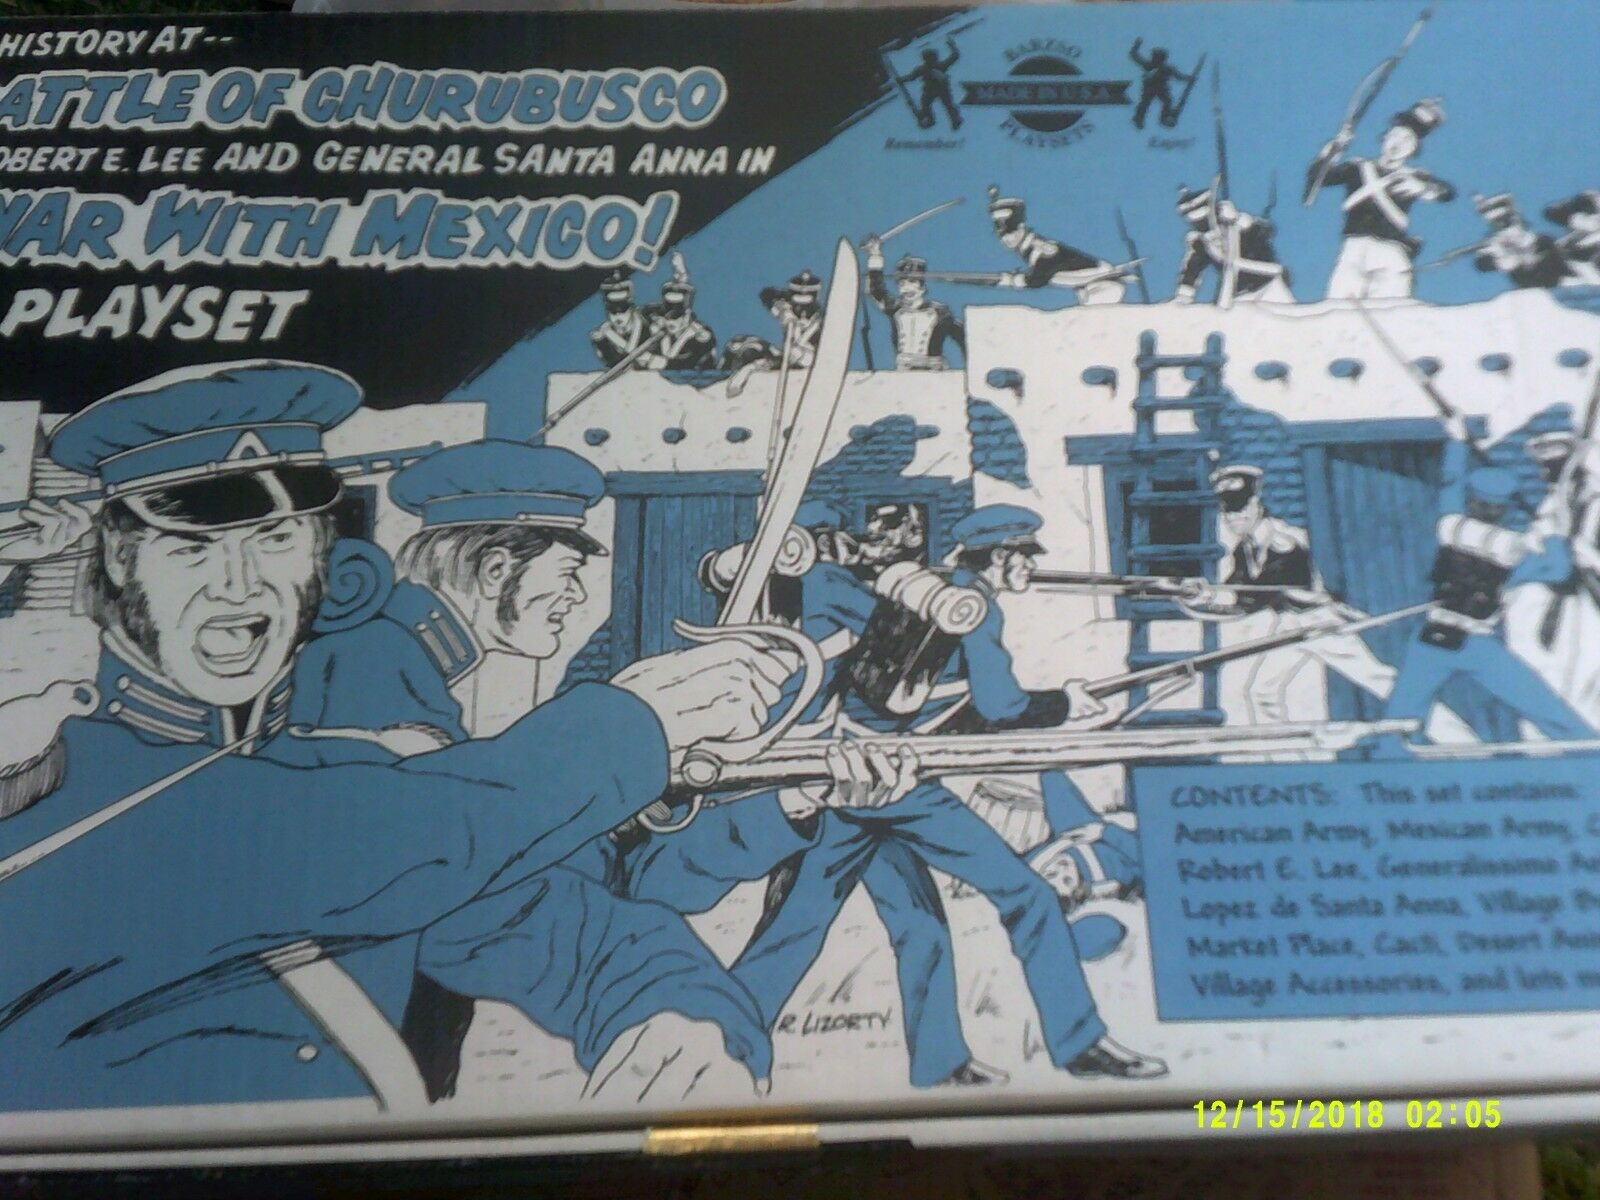 BARZSO BATTLE OF CHURROBUSCO PLAYSET COMPLETE.